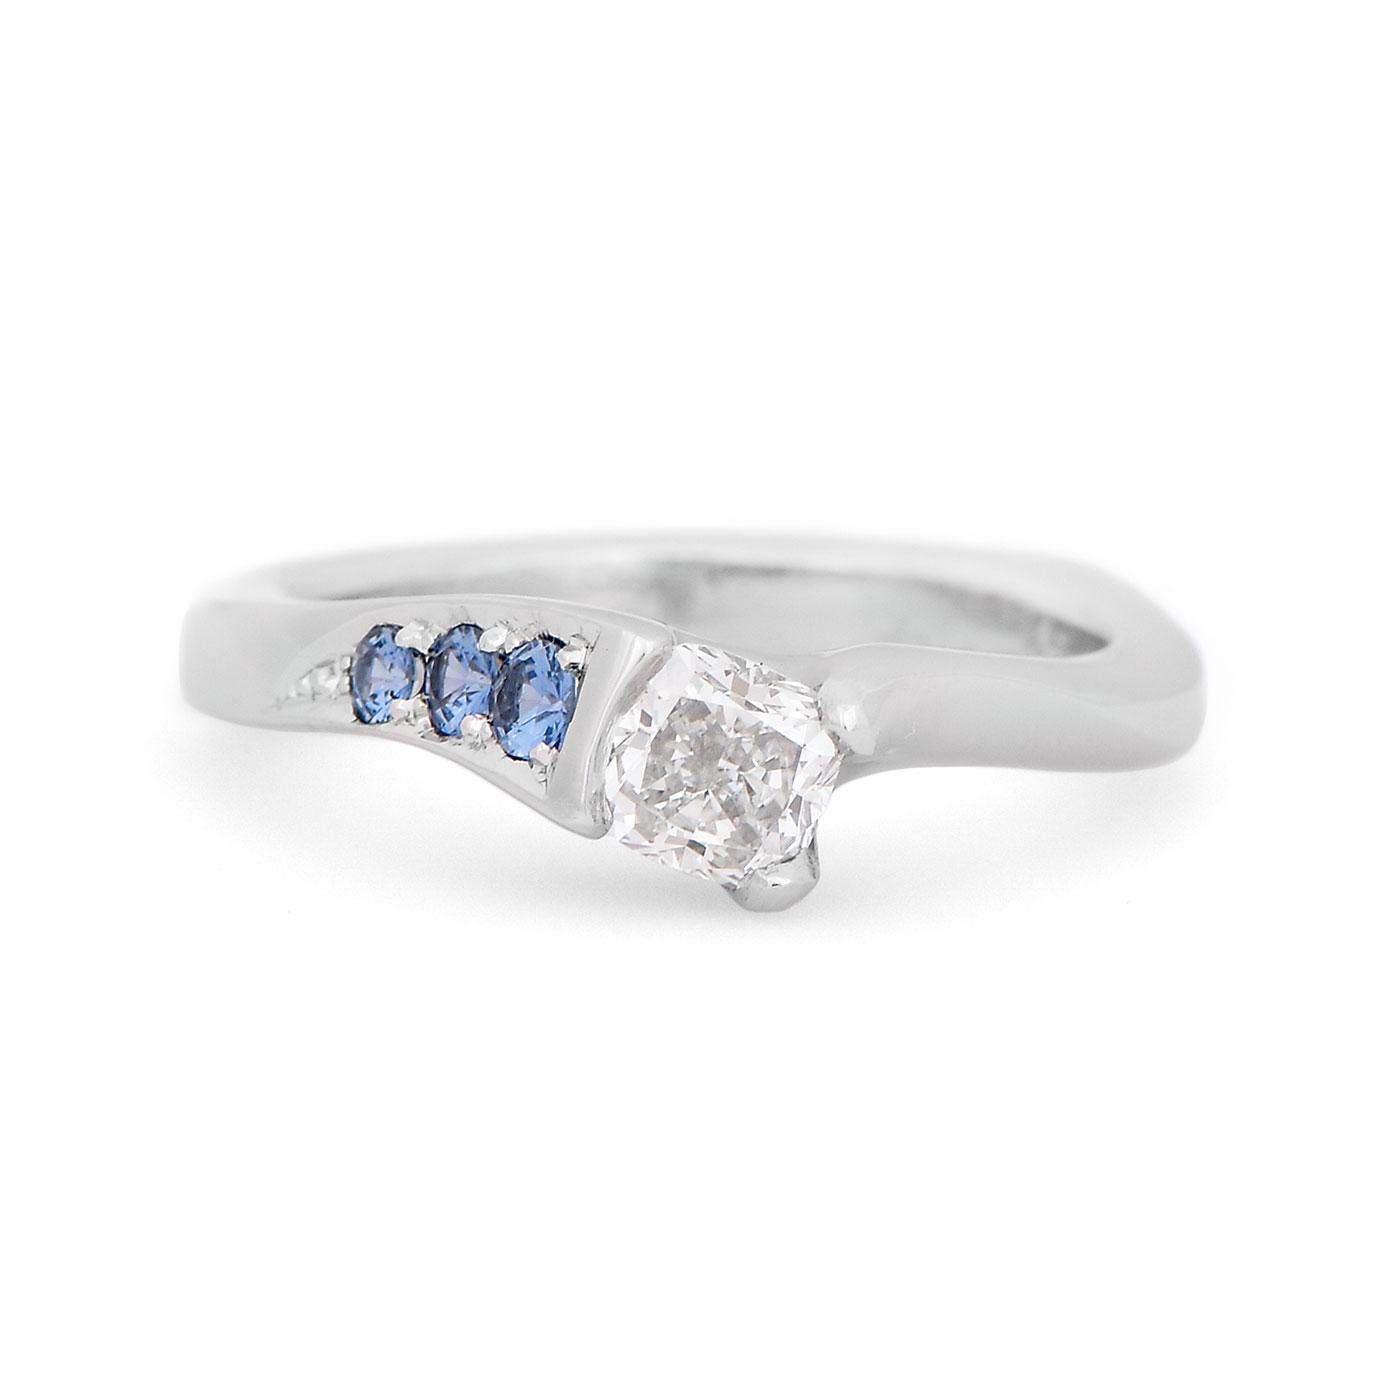 C8064 Diamond and Montana Sapphire Engagement Ring